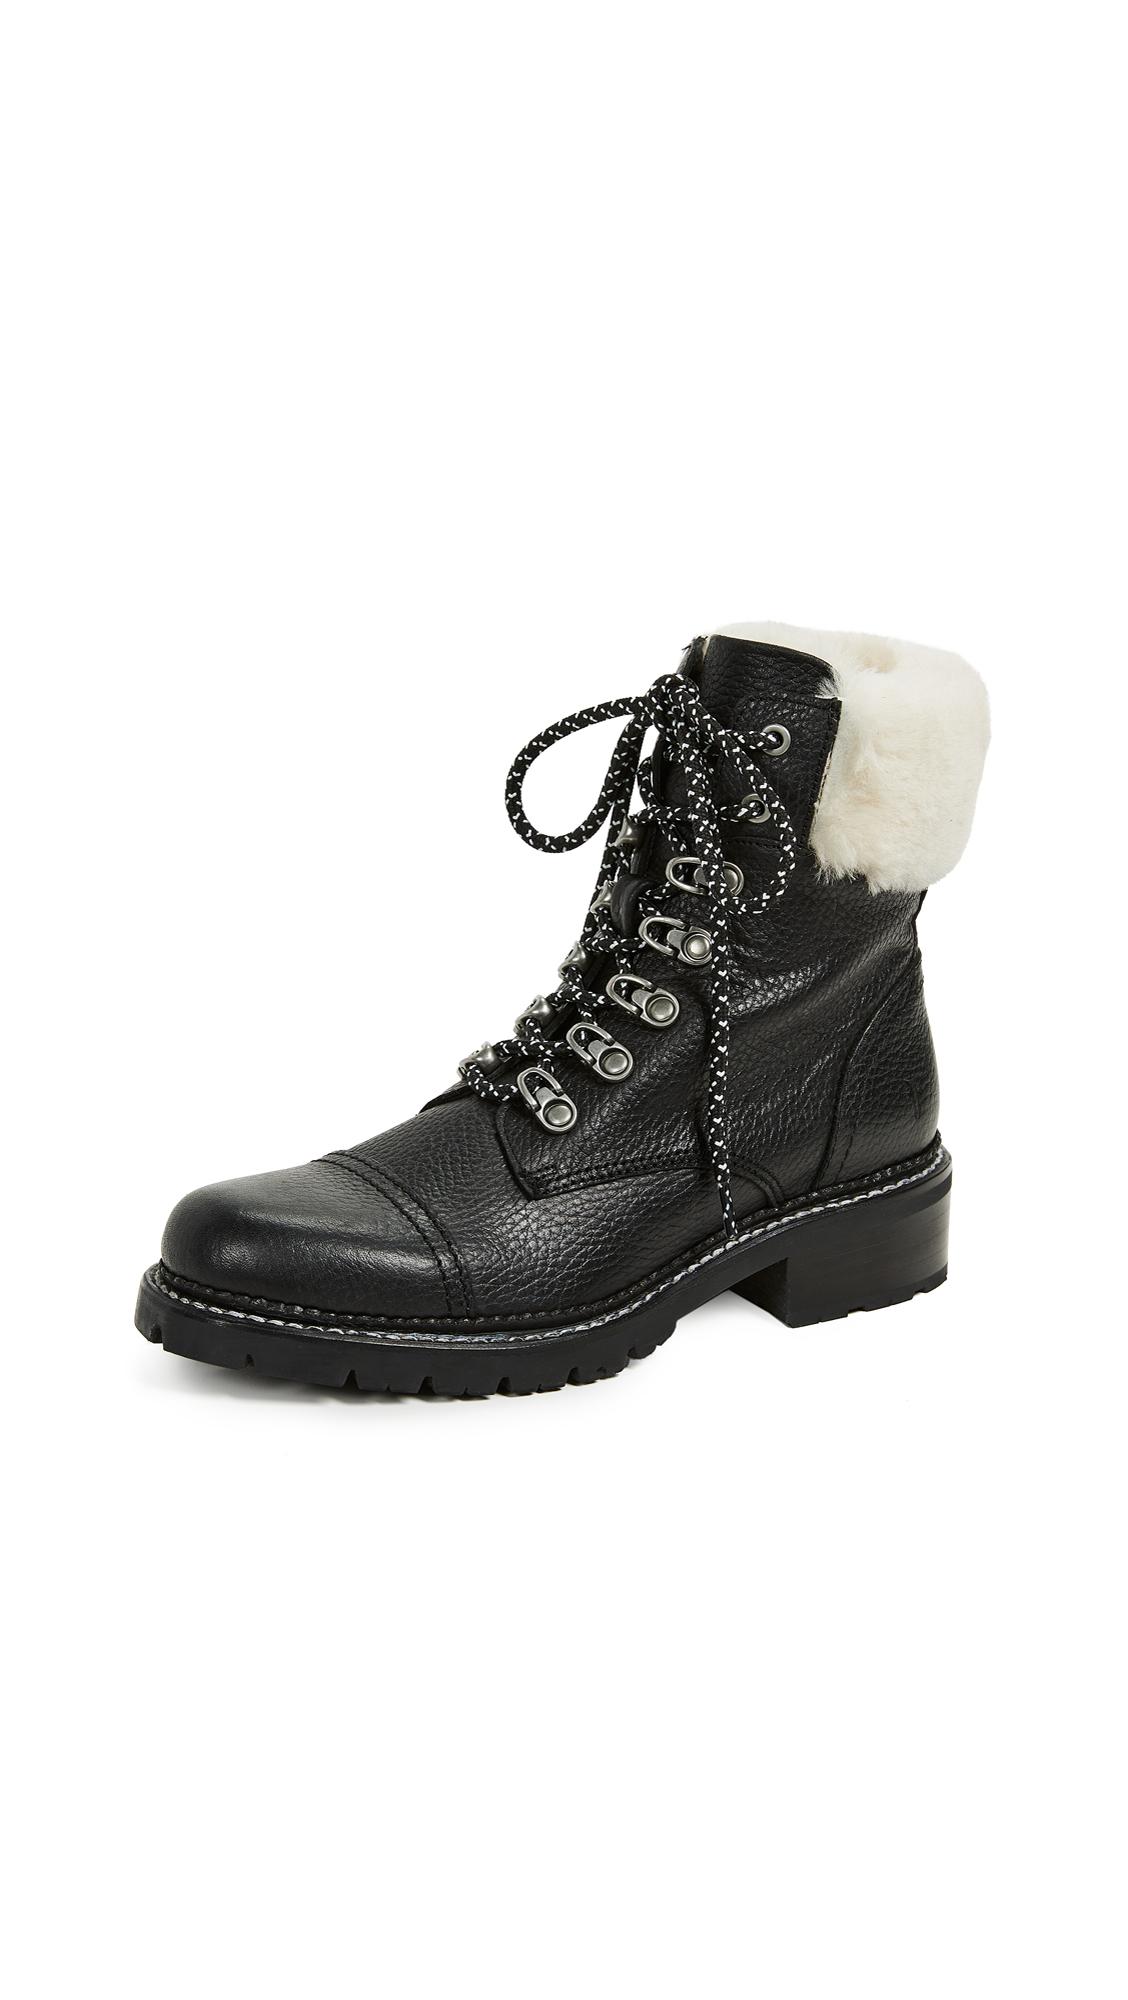 Frye Samantha Hiker Boots - Black